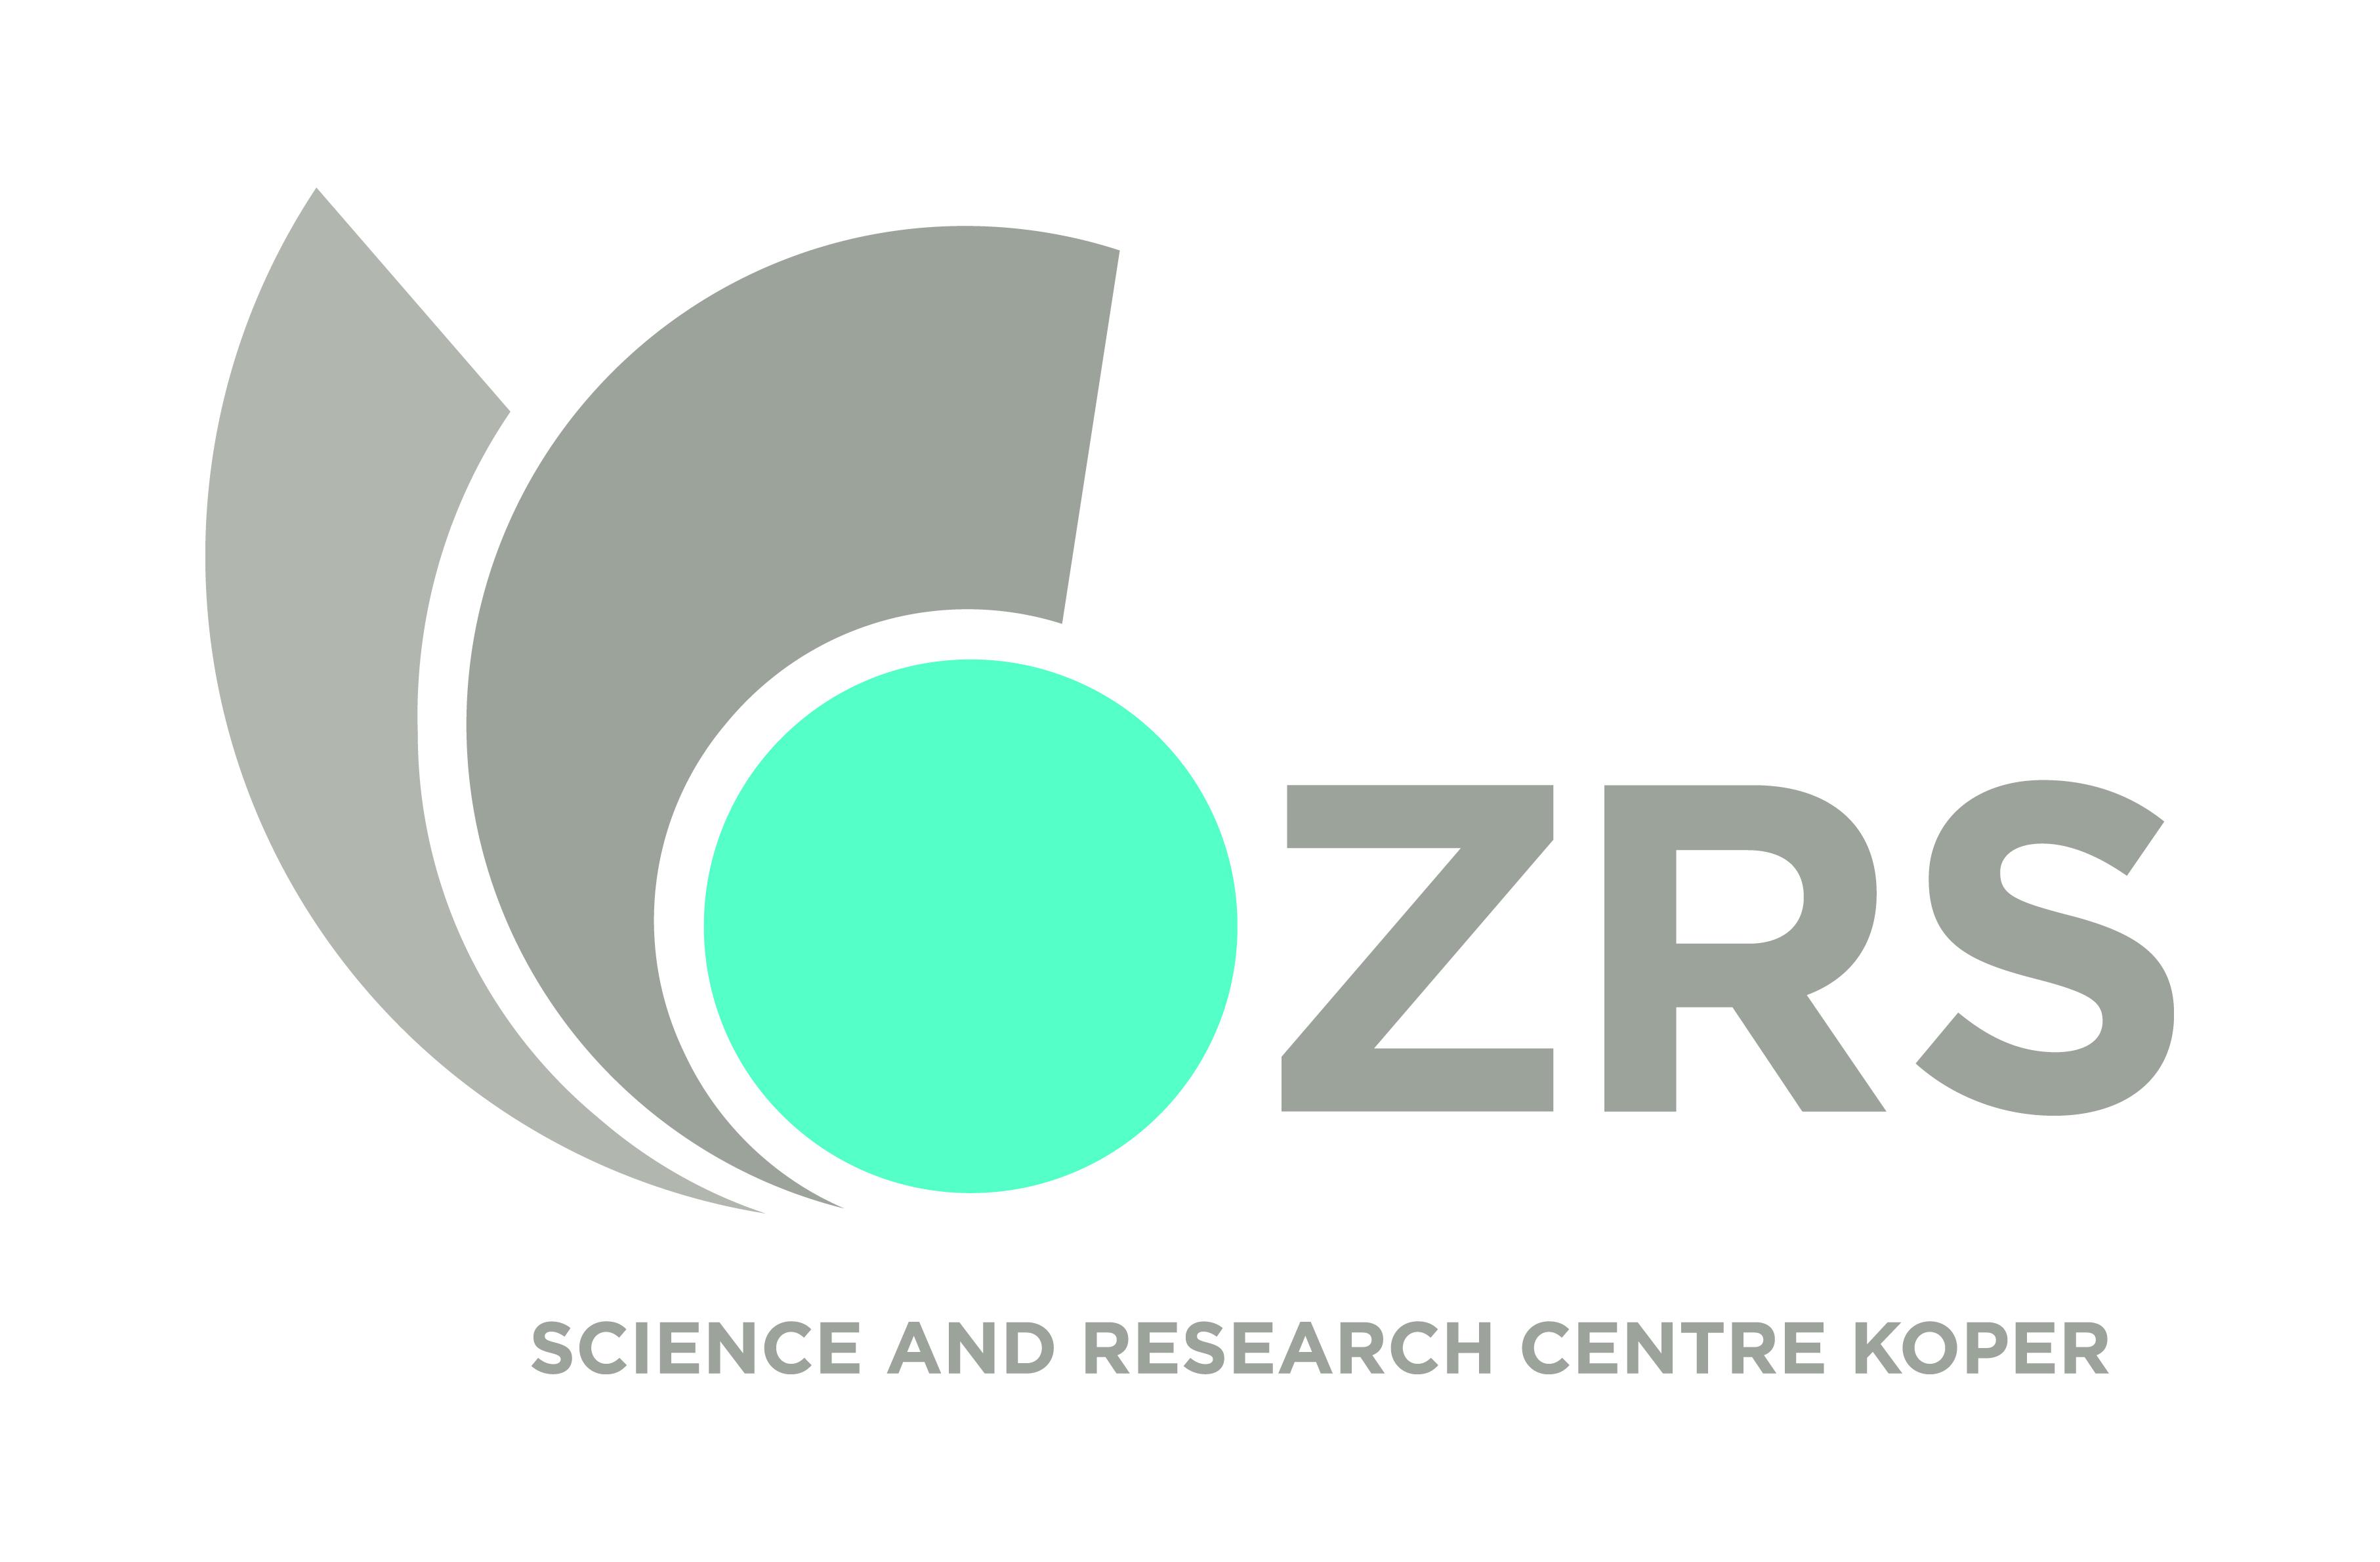 https://score-eu-project.eu/wp-content/uploads/2021/09/19.-Logotip-ZRS-ANG_Logotip-ZRS.jpg